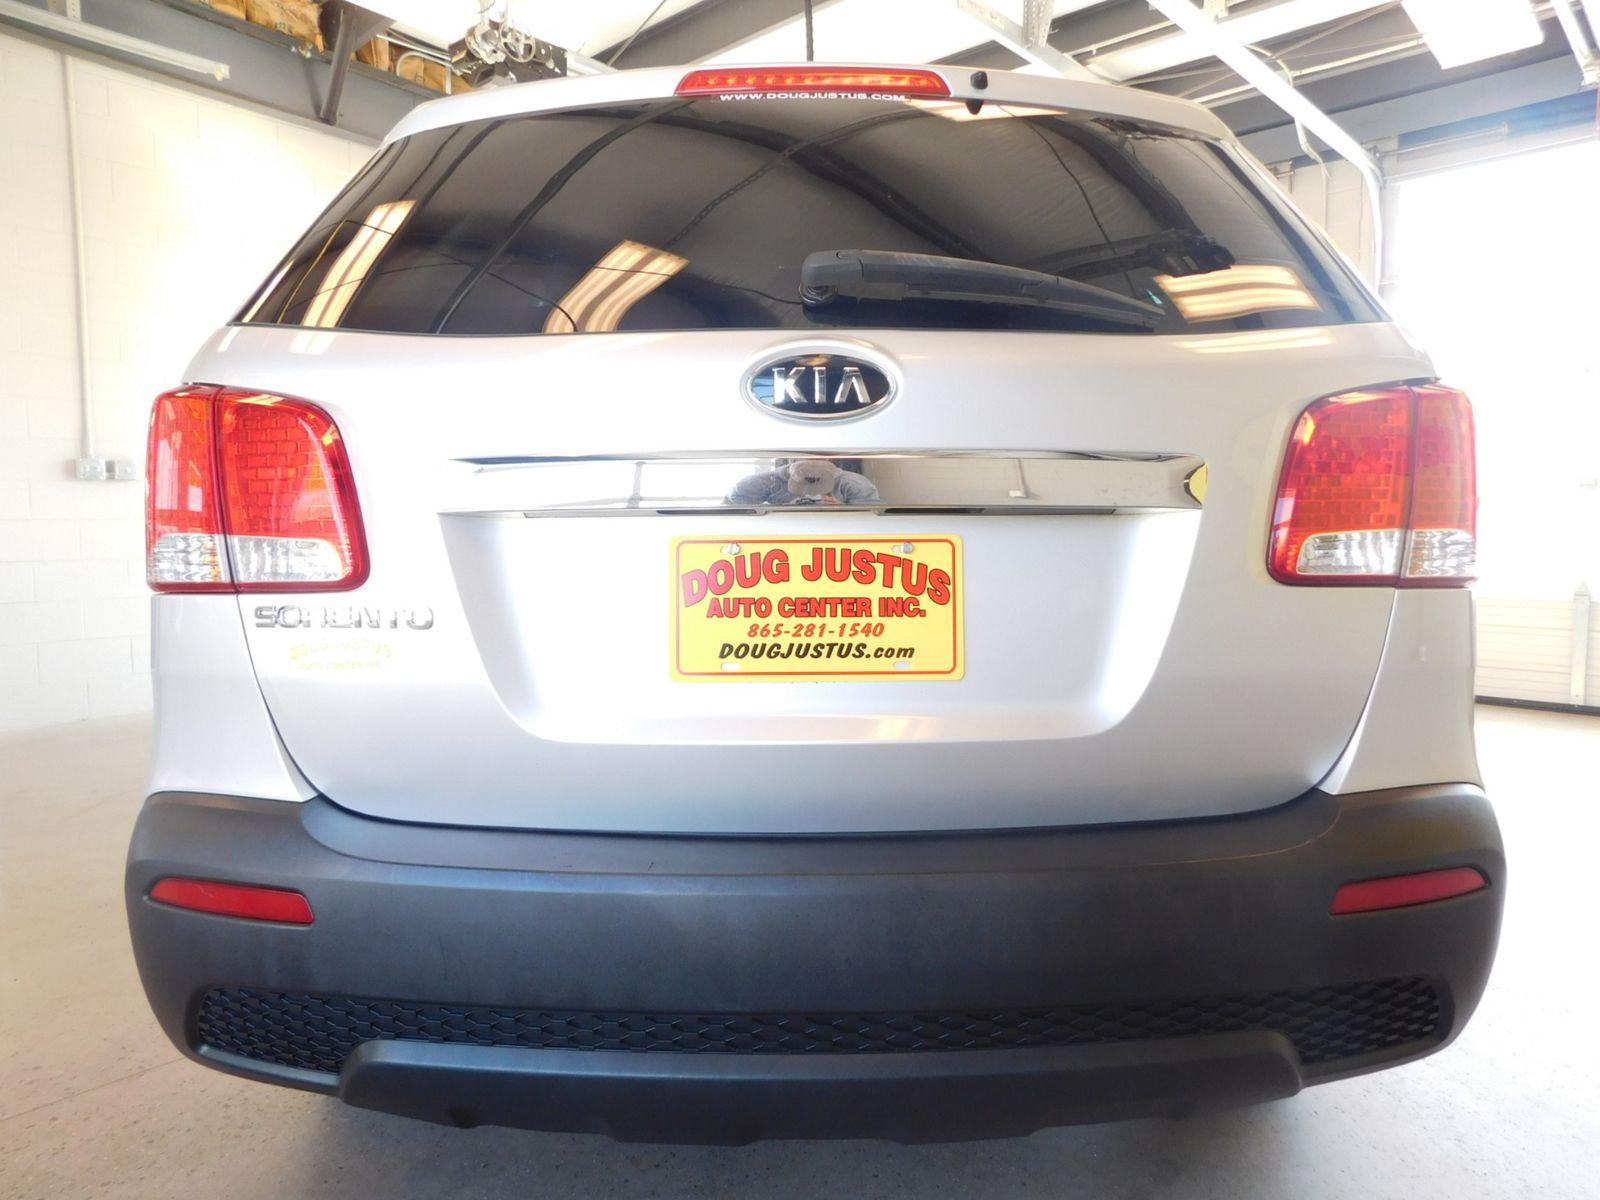 2012 Kia Sorento Lx City Tn Doug Justus Auto Center Inc Fuel Filter In Airport Motor Mile